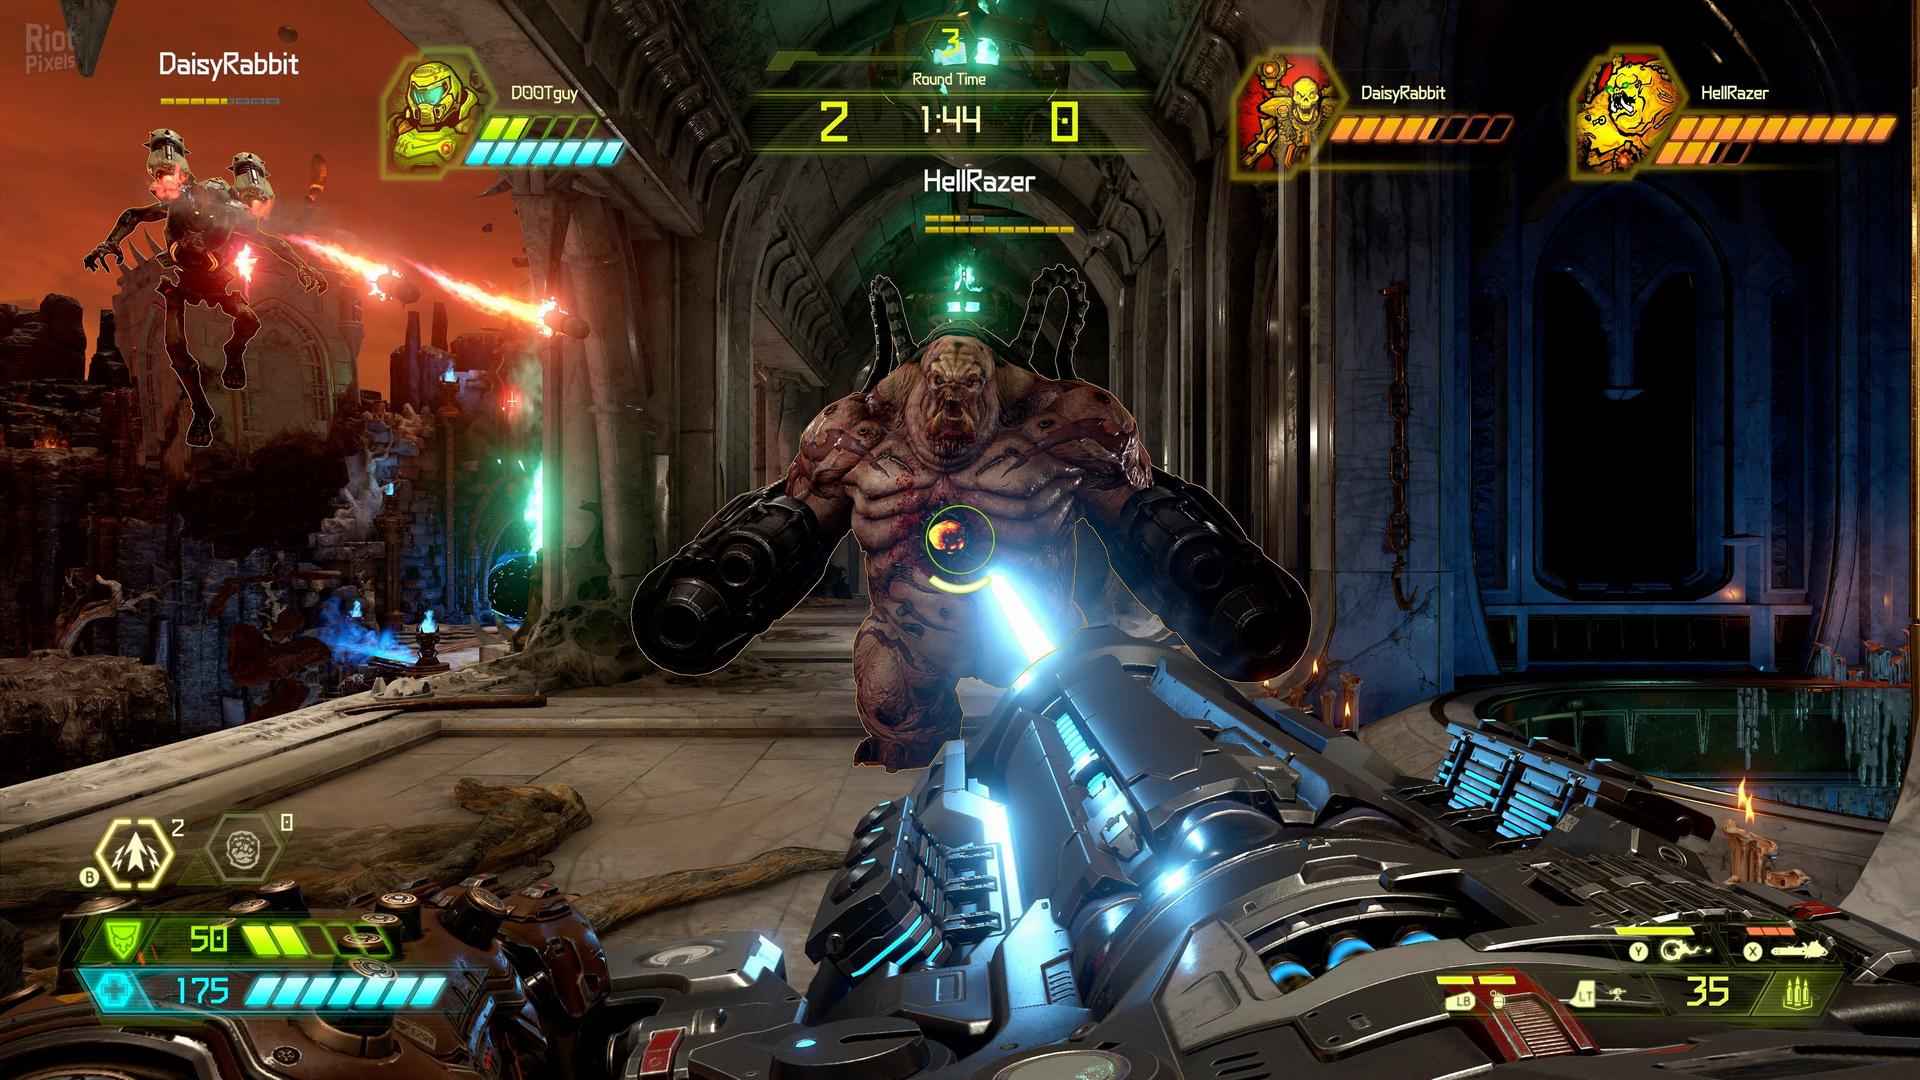 Doom Eternal - game screenshots at Riot Pixels, images